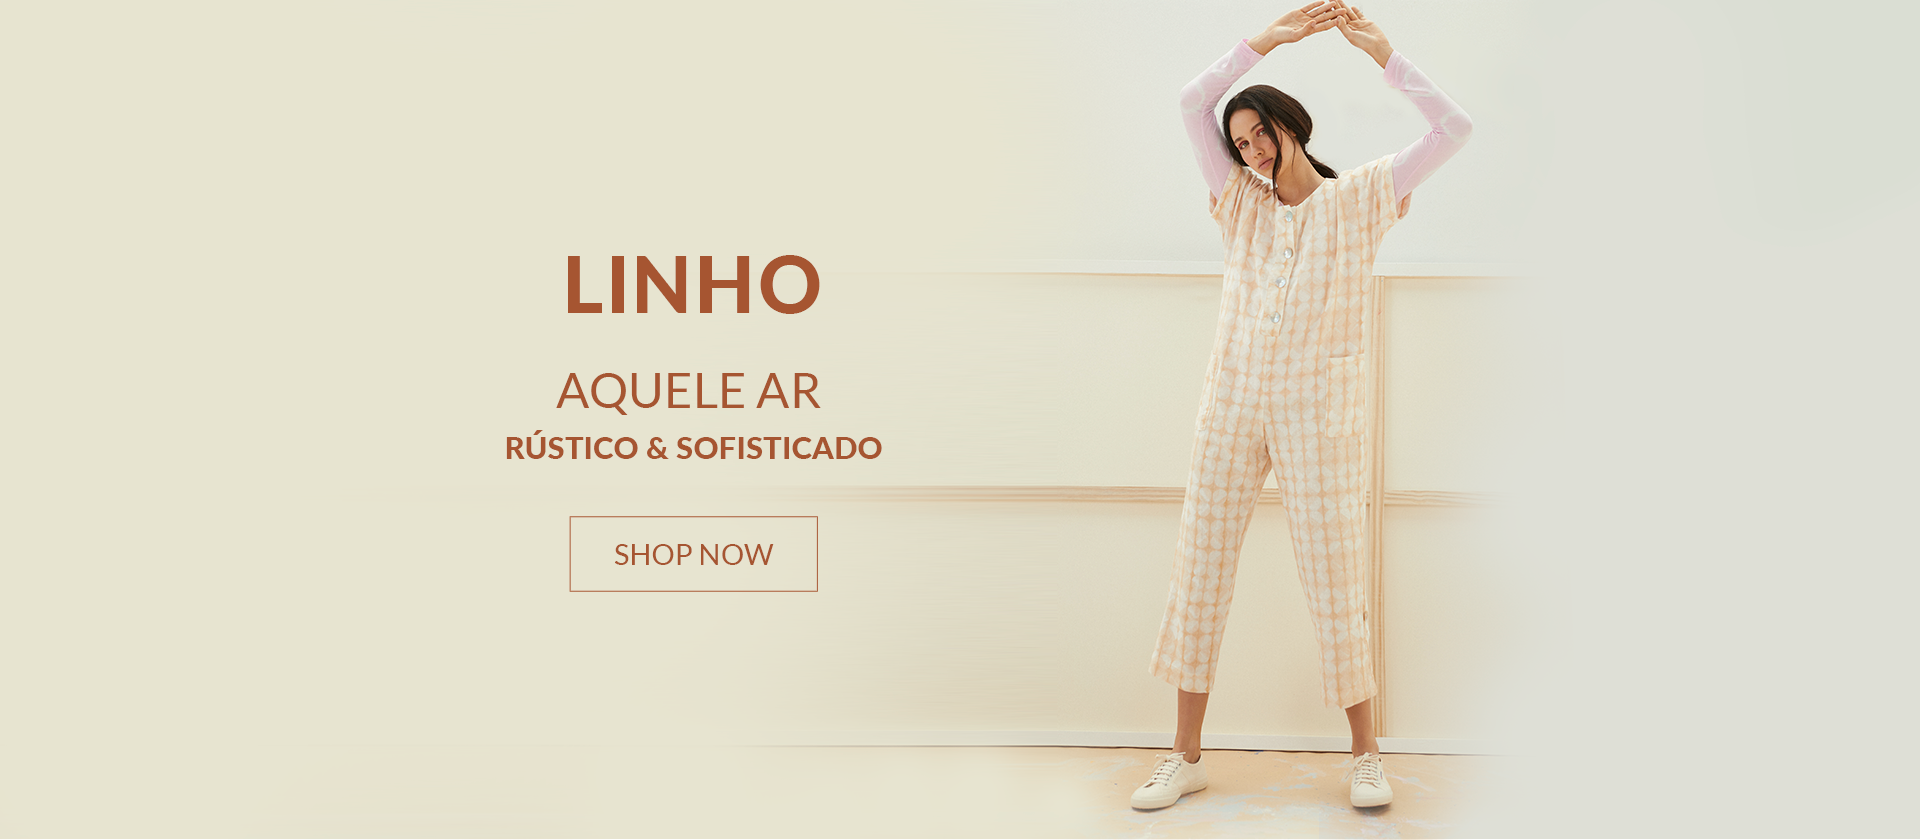 Banner Linho - Desktop